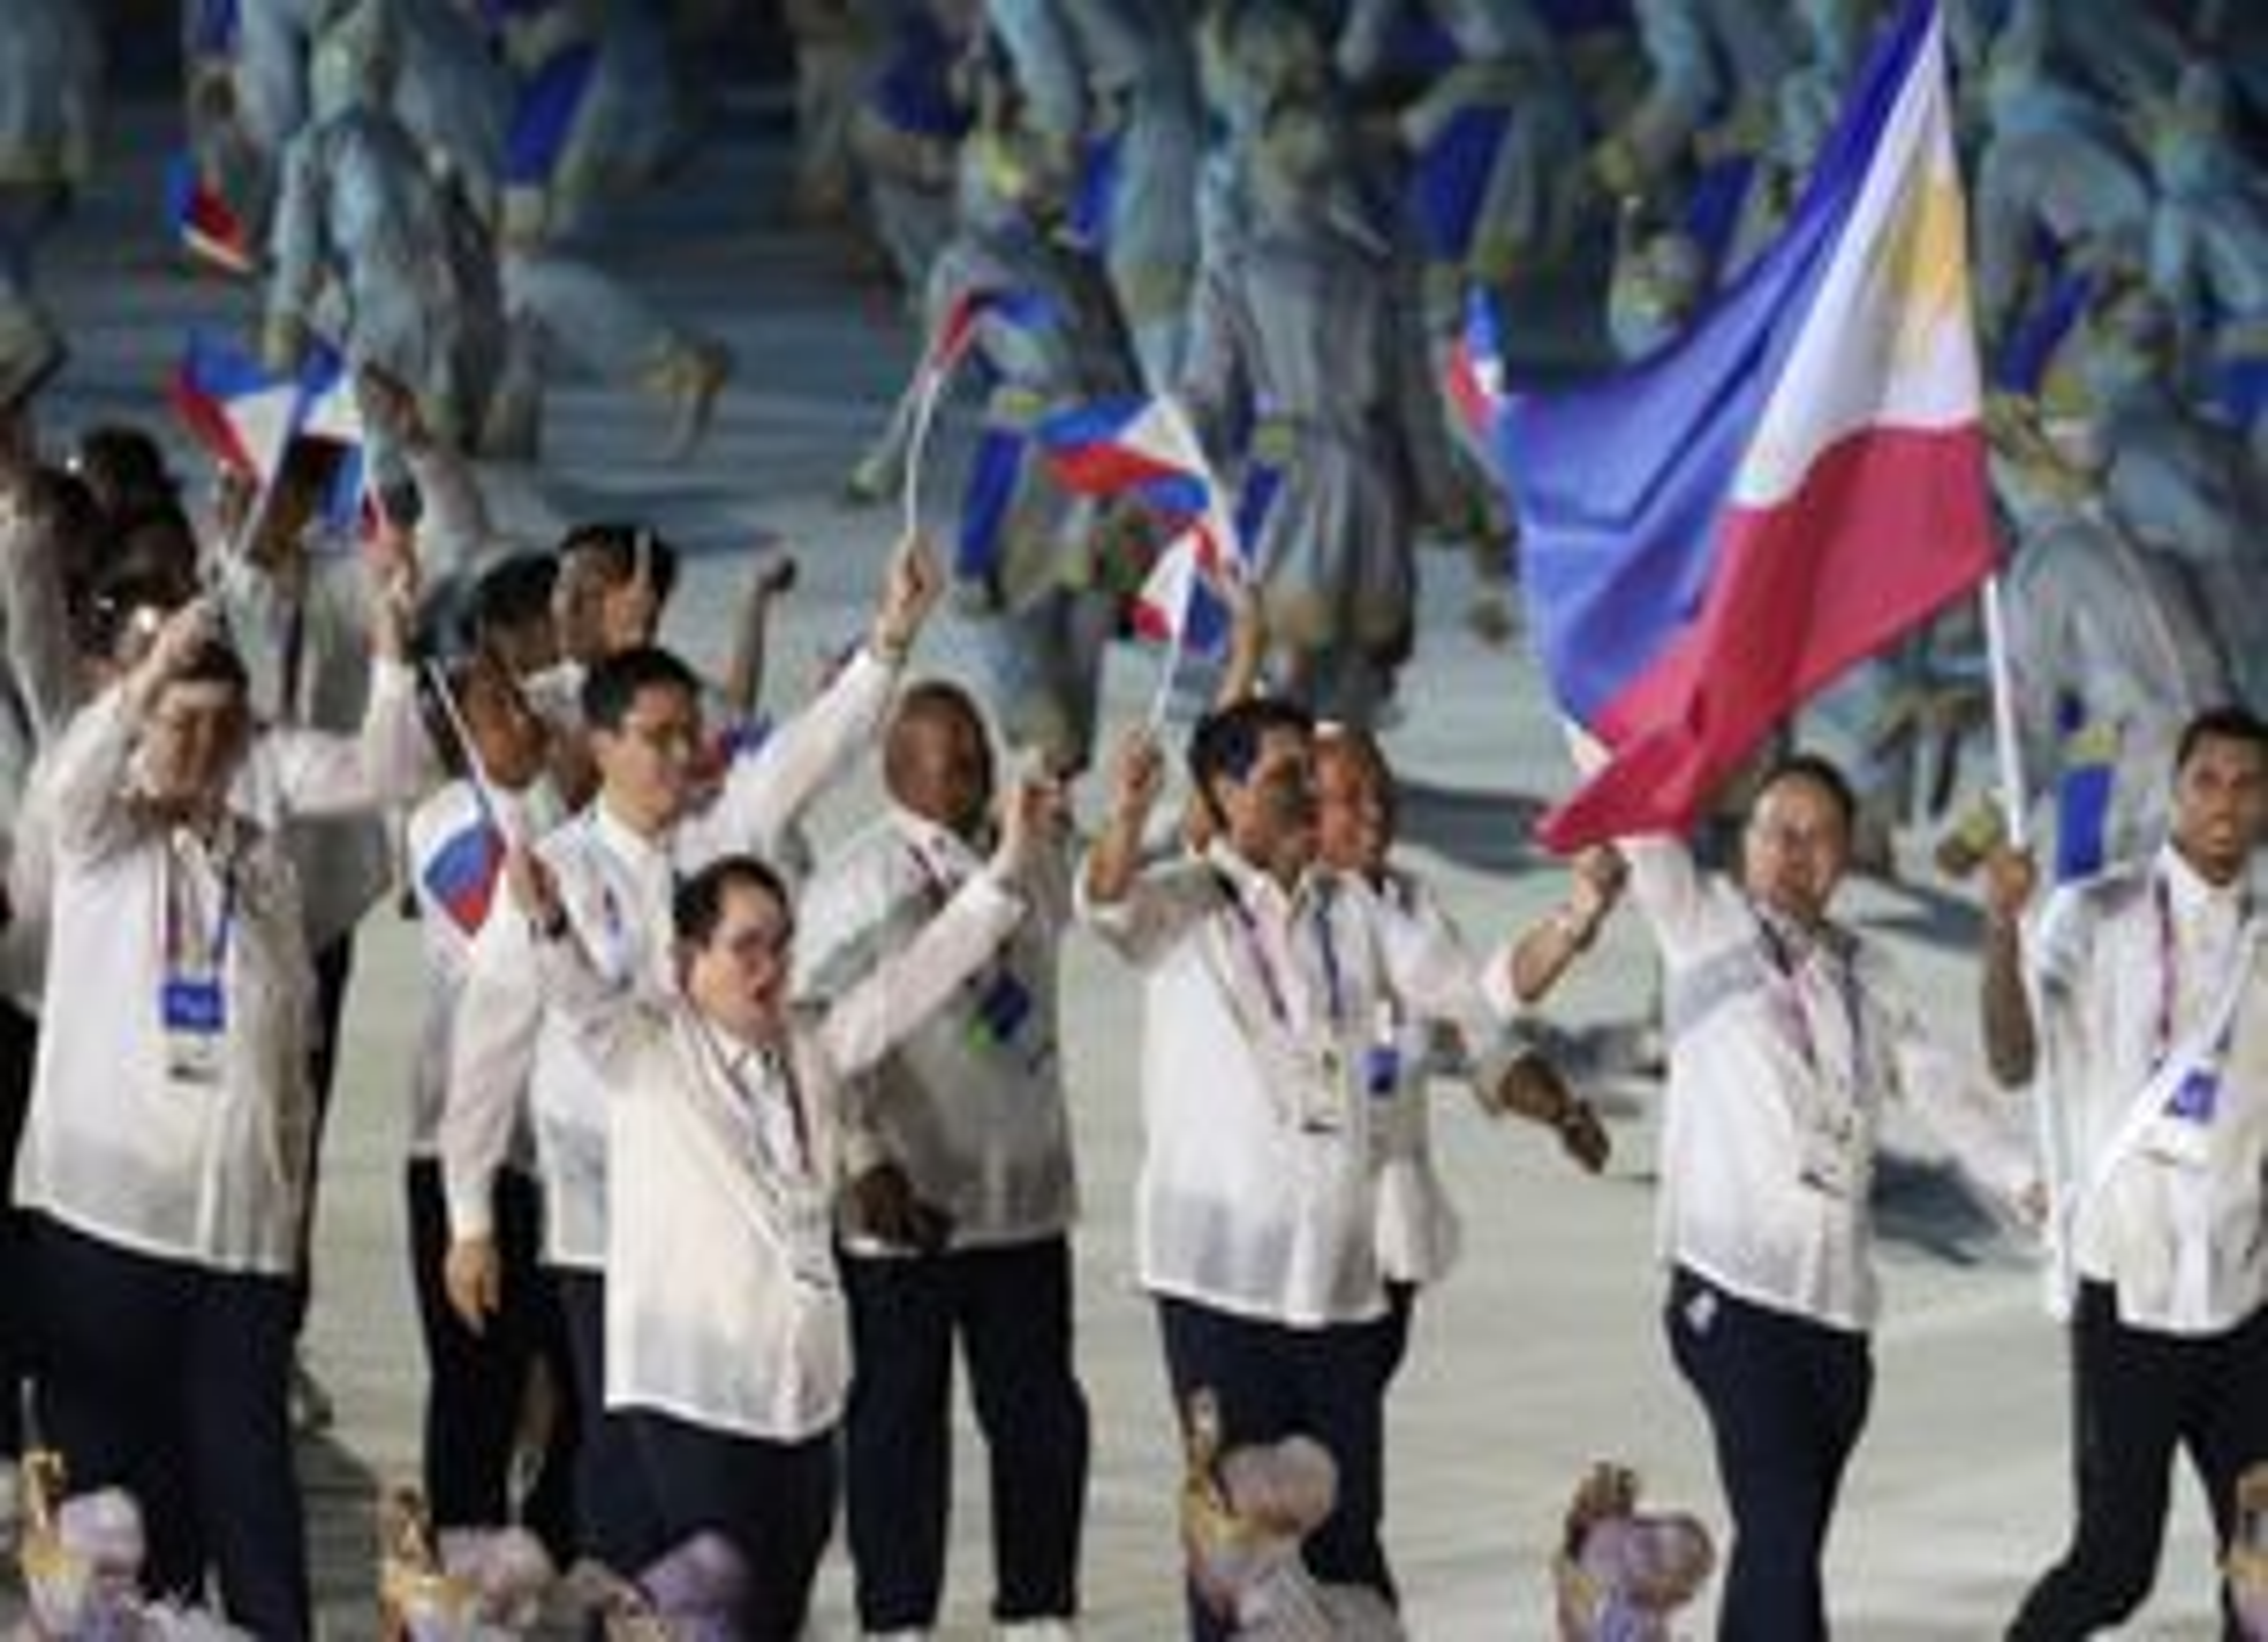 Philippines dự kiến tổ chức lễ khai mạc SEA Games ở sân trong nhà